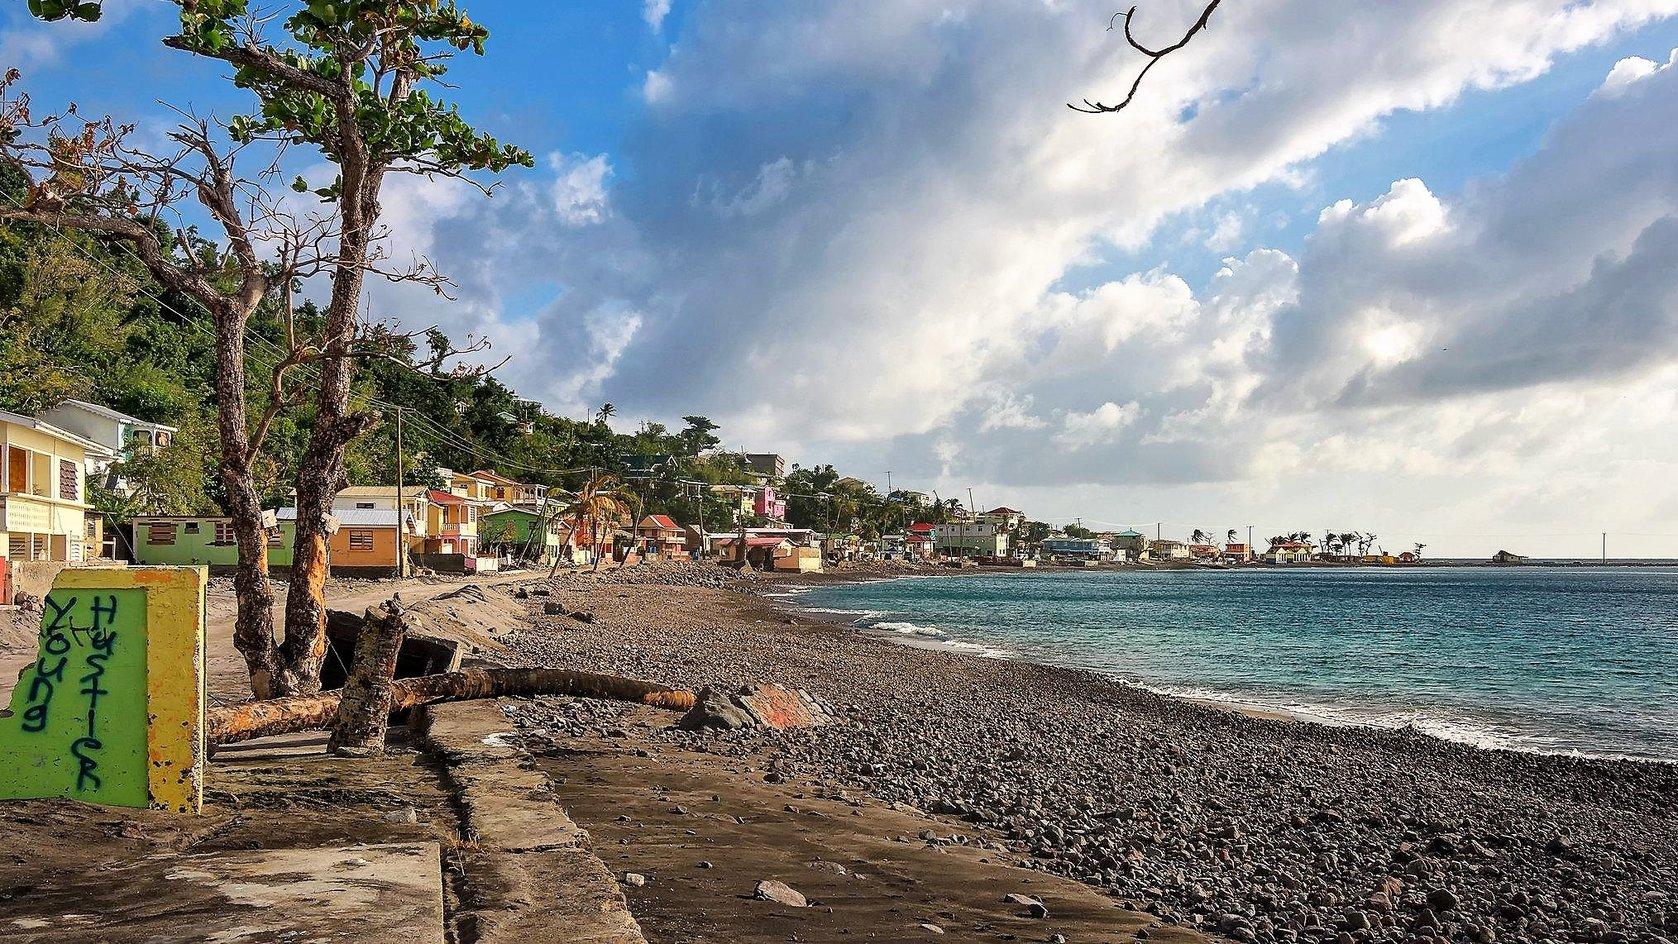 Scotshead Dominica (New York Times photo)